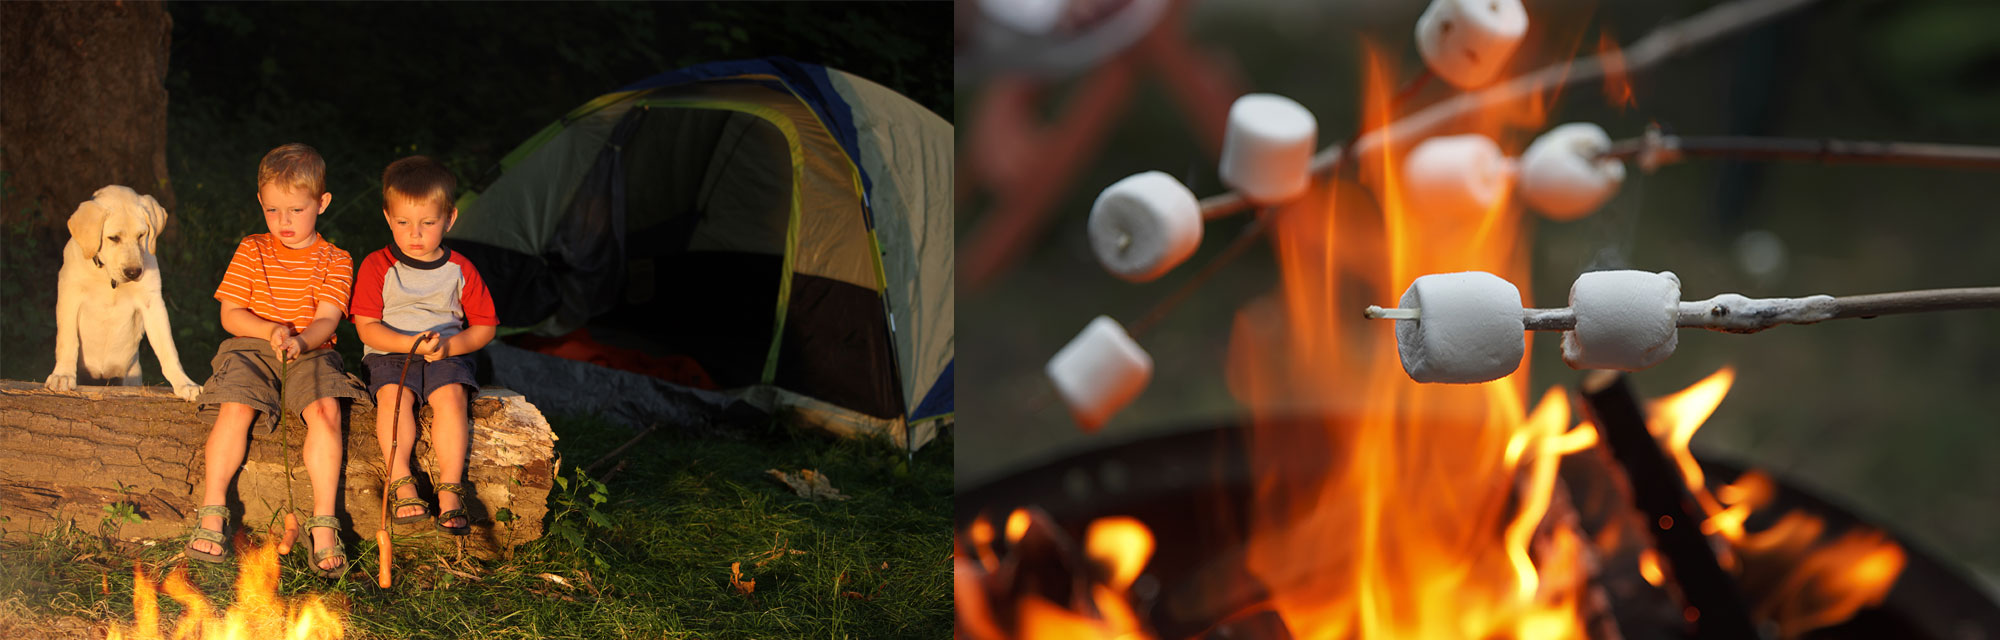 Camping Mosquito Repellent